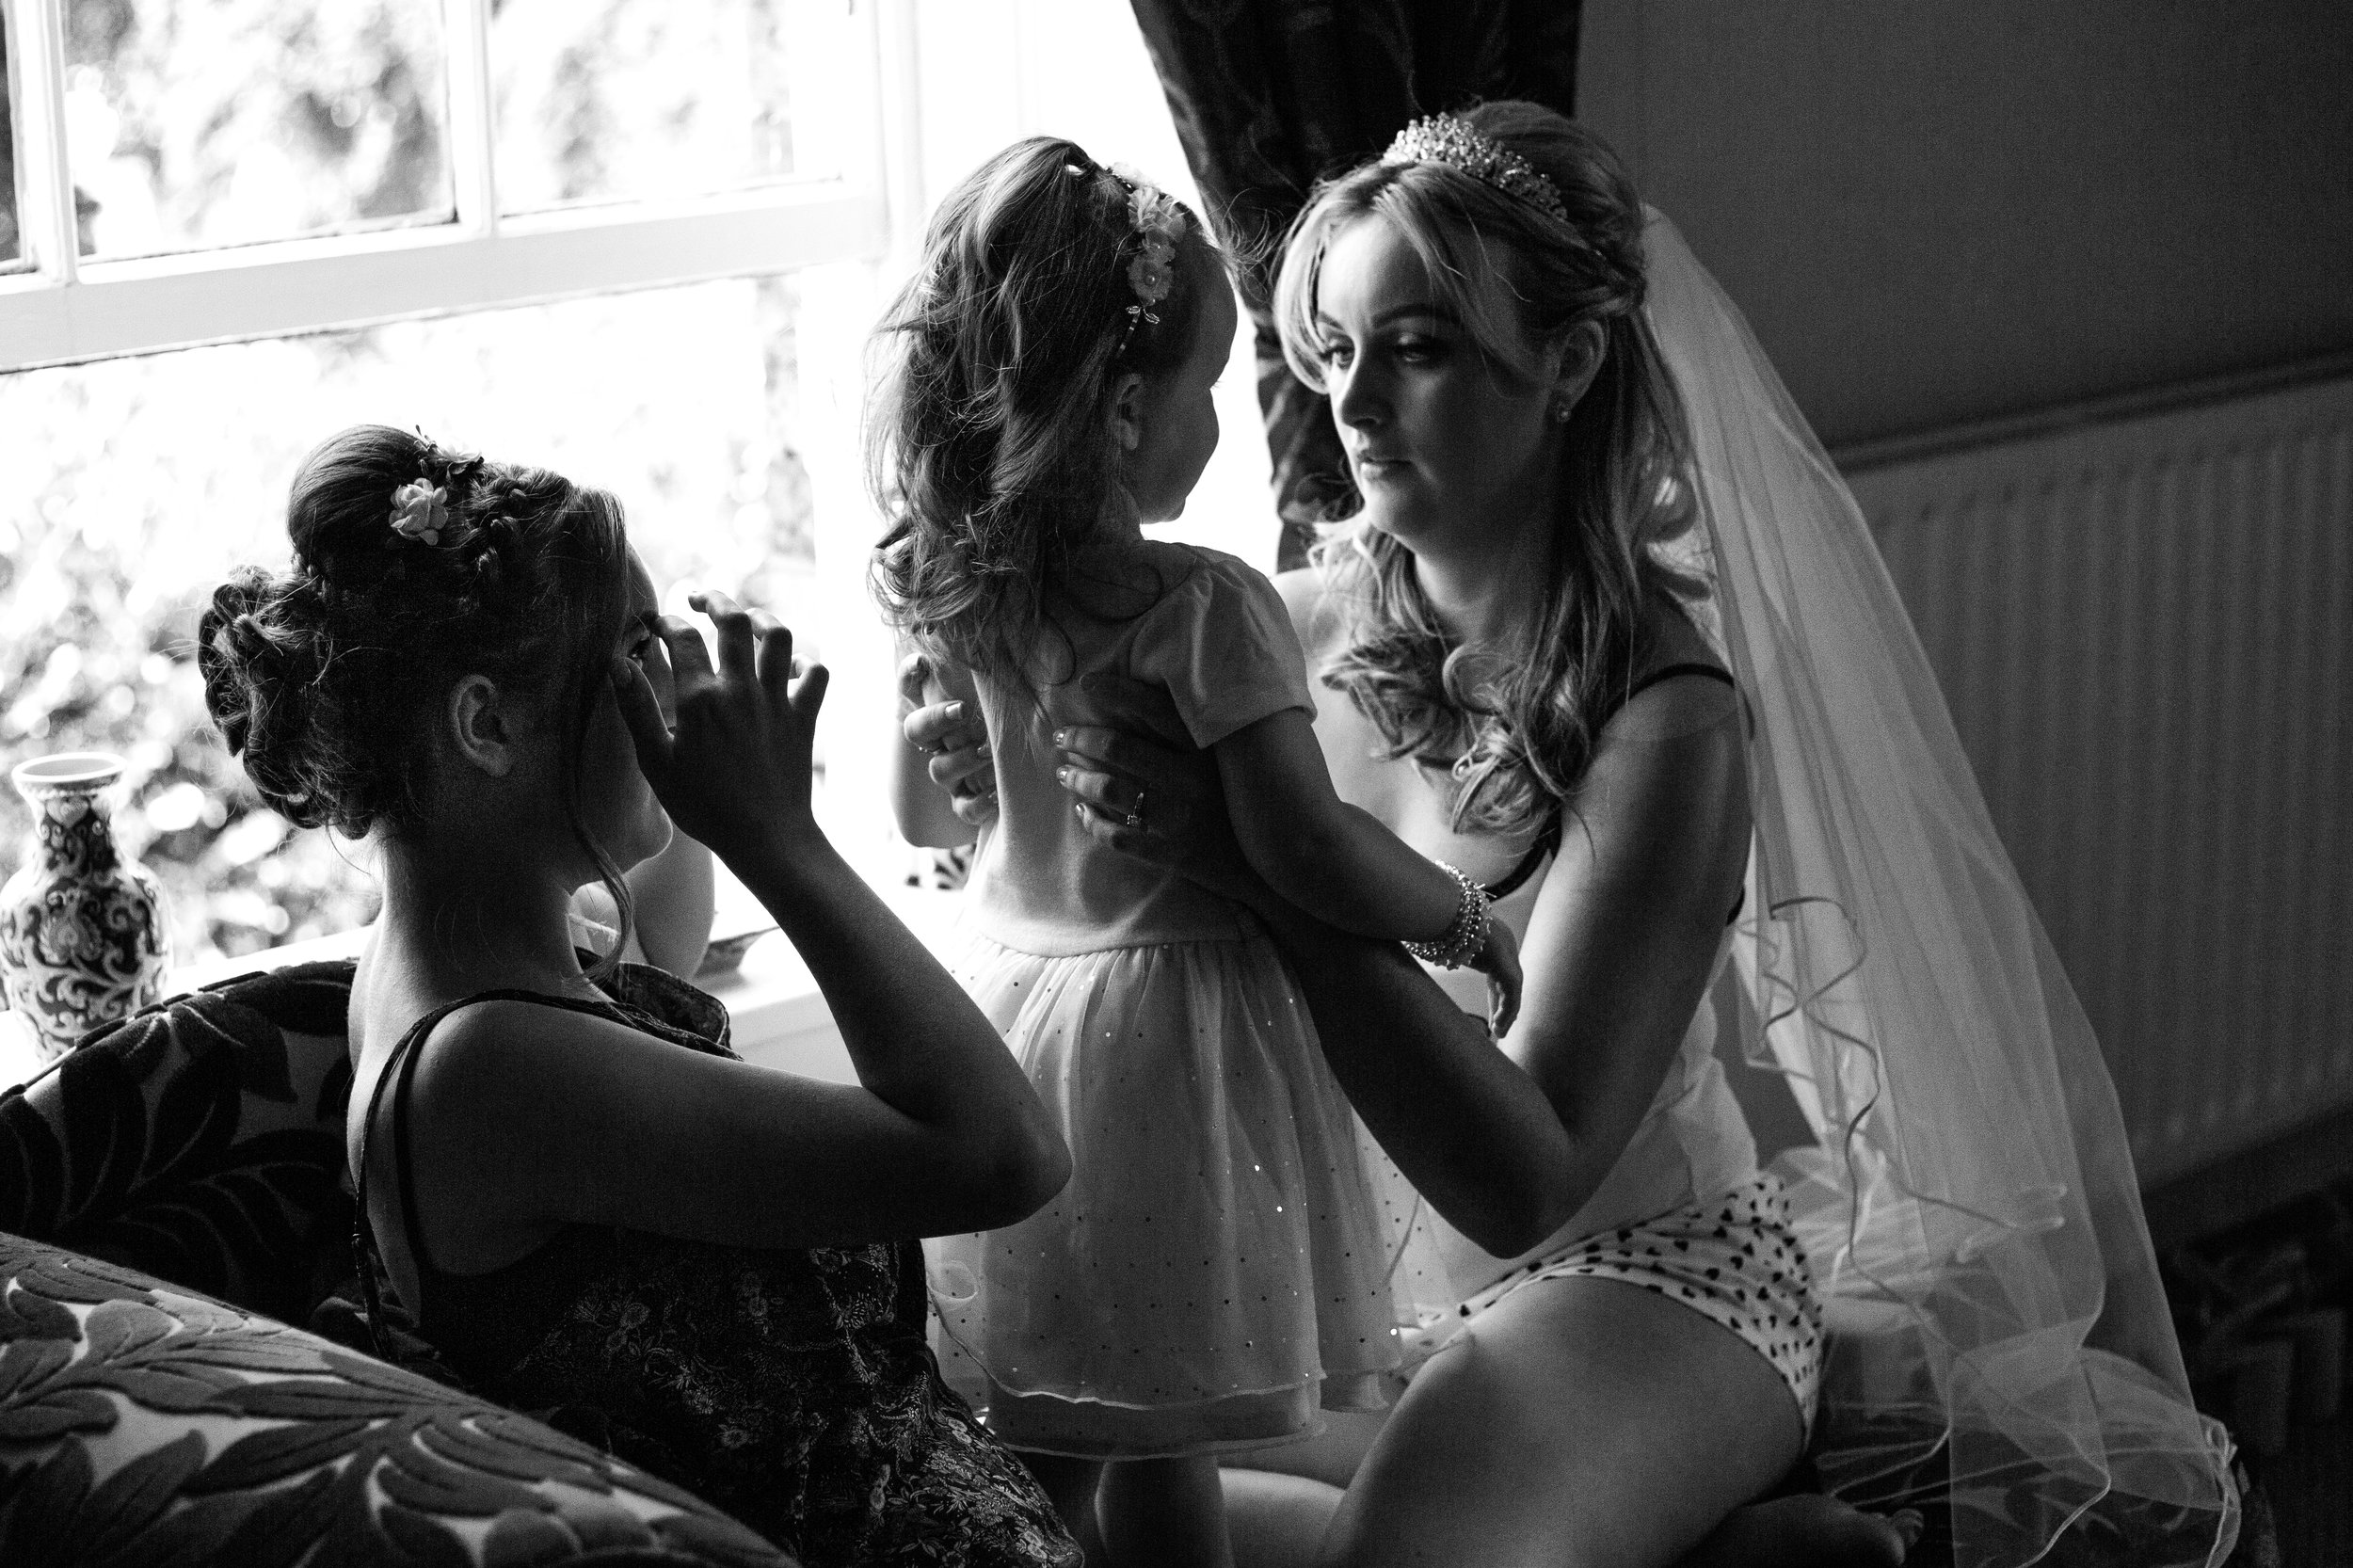 wedding-lea-cooper-photography-willenhall-west-midlands-wolverhampton-dudley-birmingham-uk-marriage-hadley-park-east-telford-window-black-white.jpg